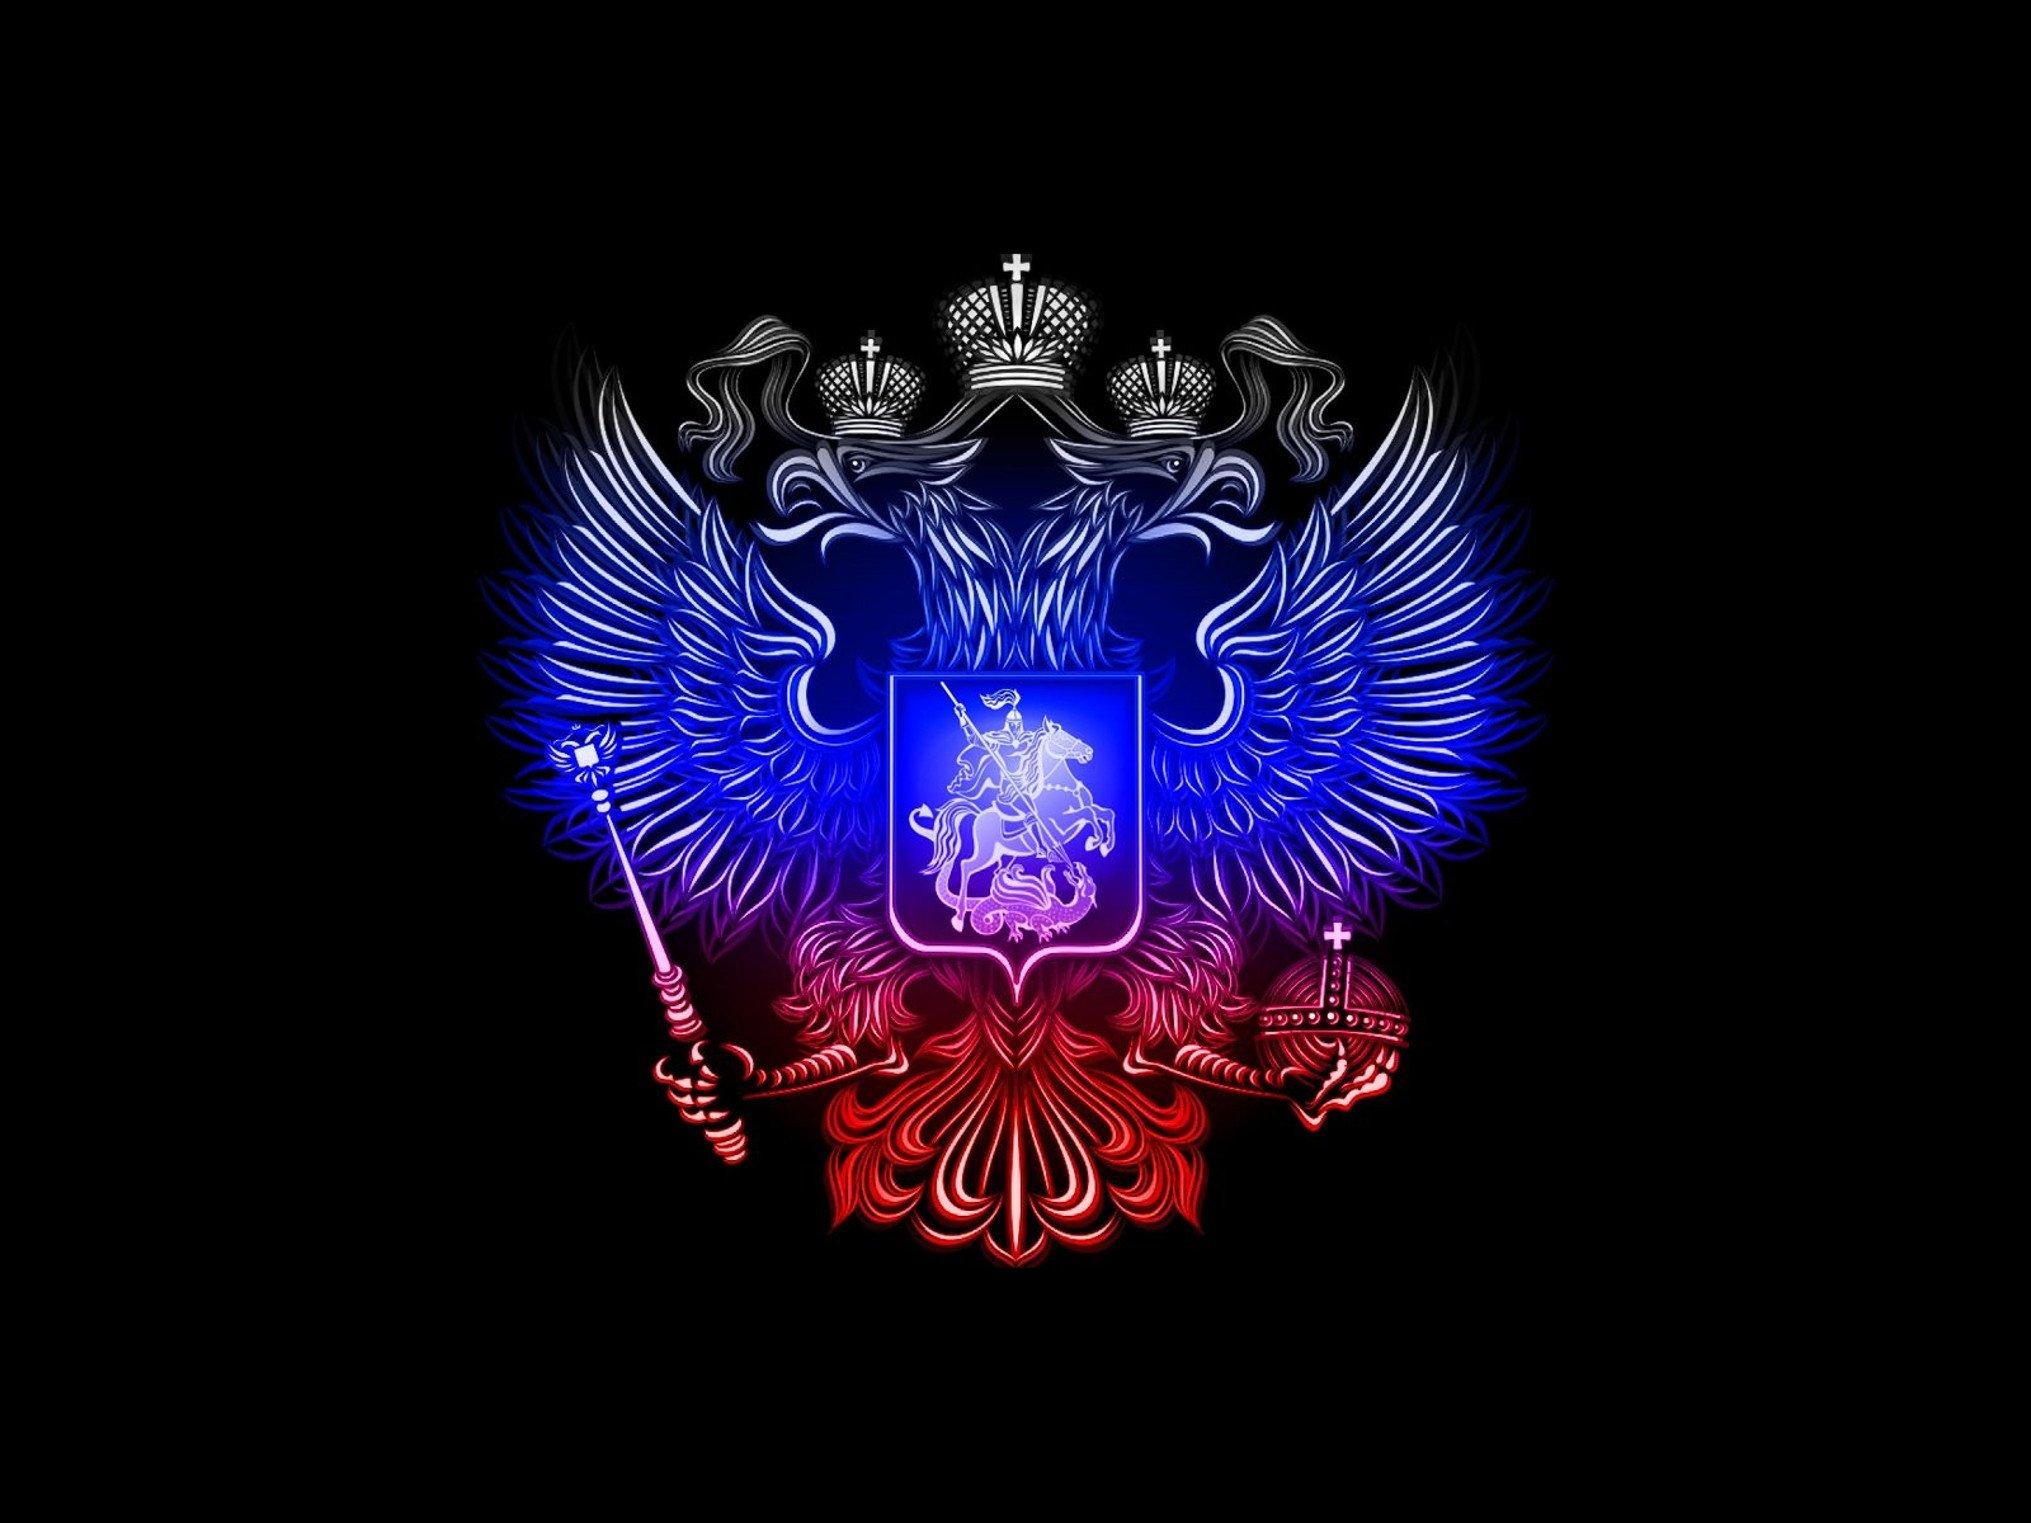 Donetsk Lugansk Nova Russia Wallpaper  0x0 619909